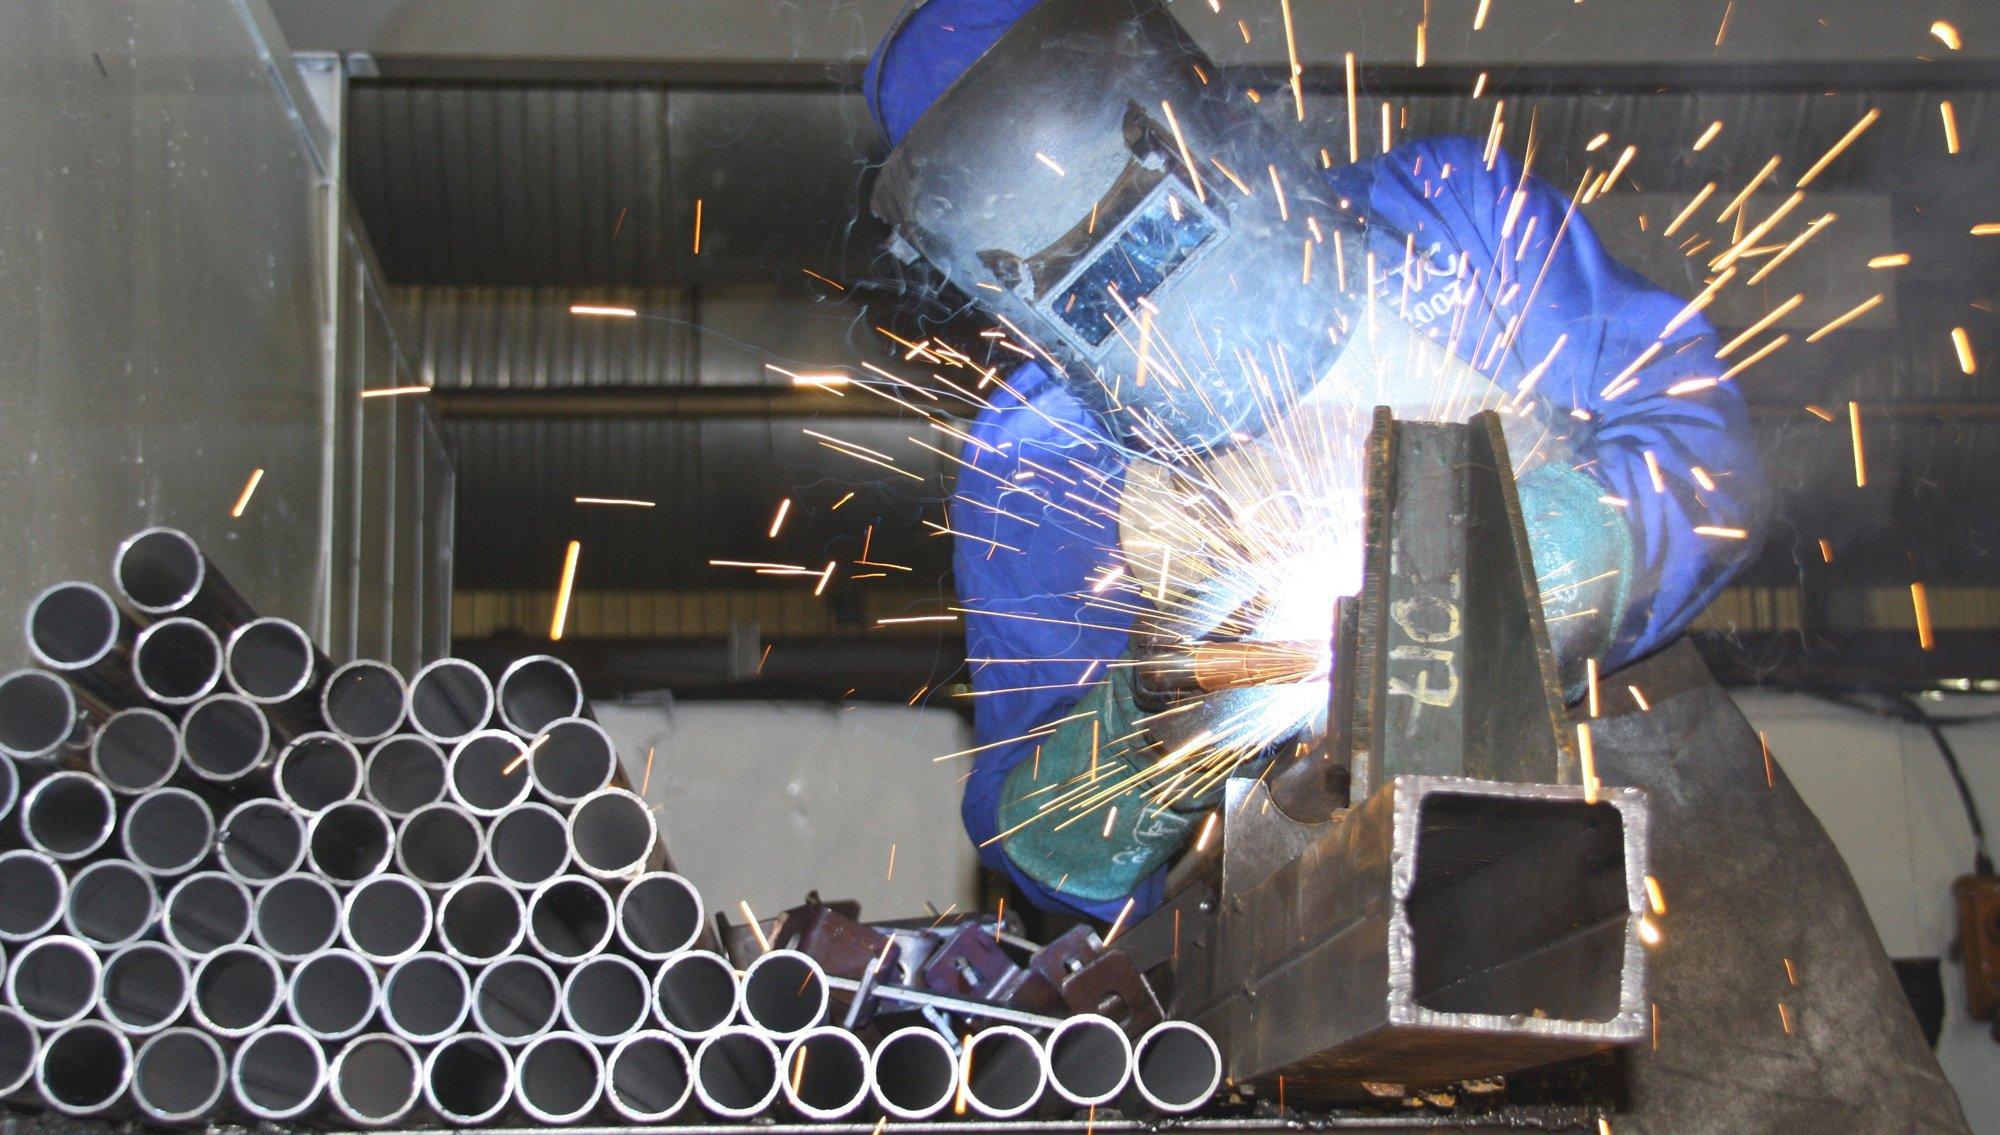 Fabrication expert doing metal fabrication in Honolulu, HI